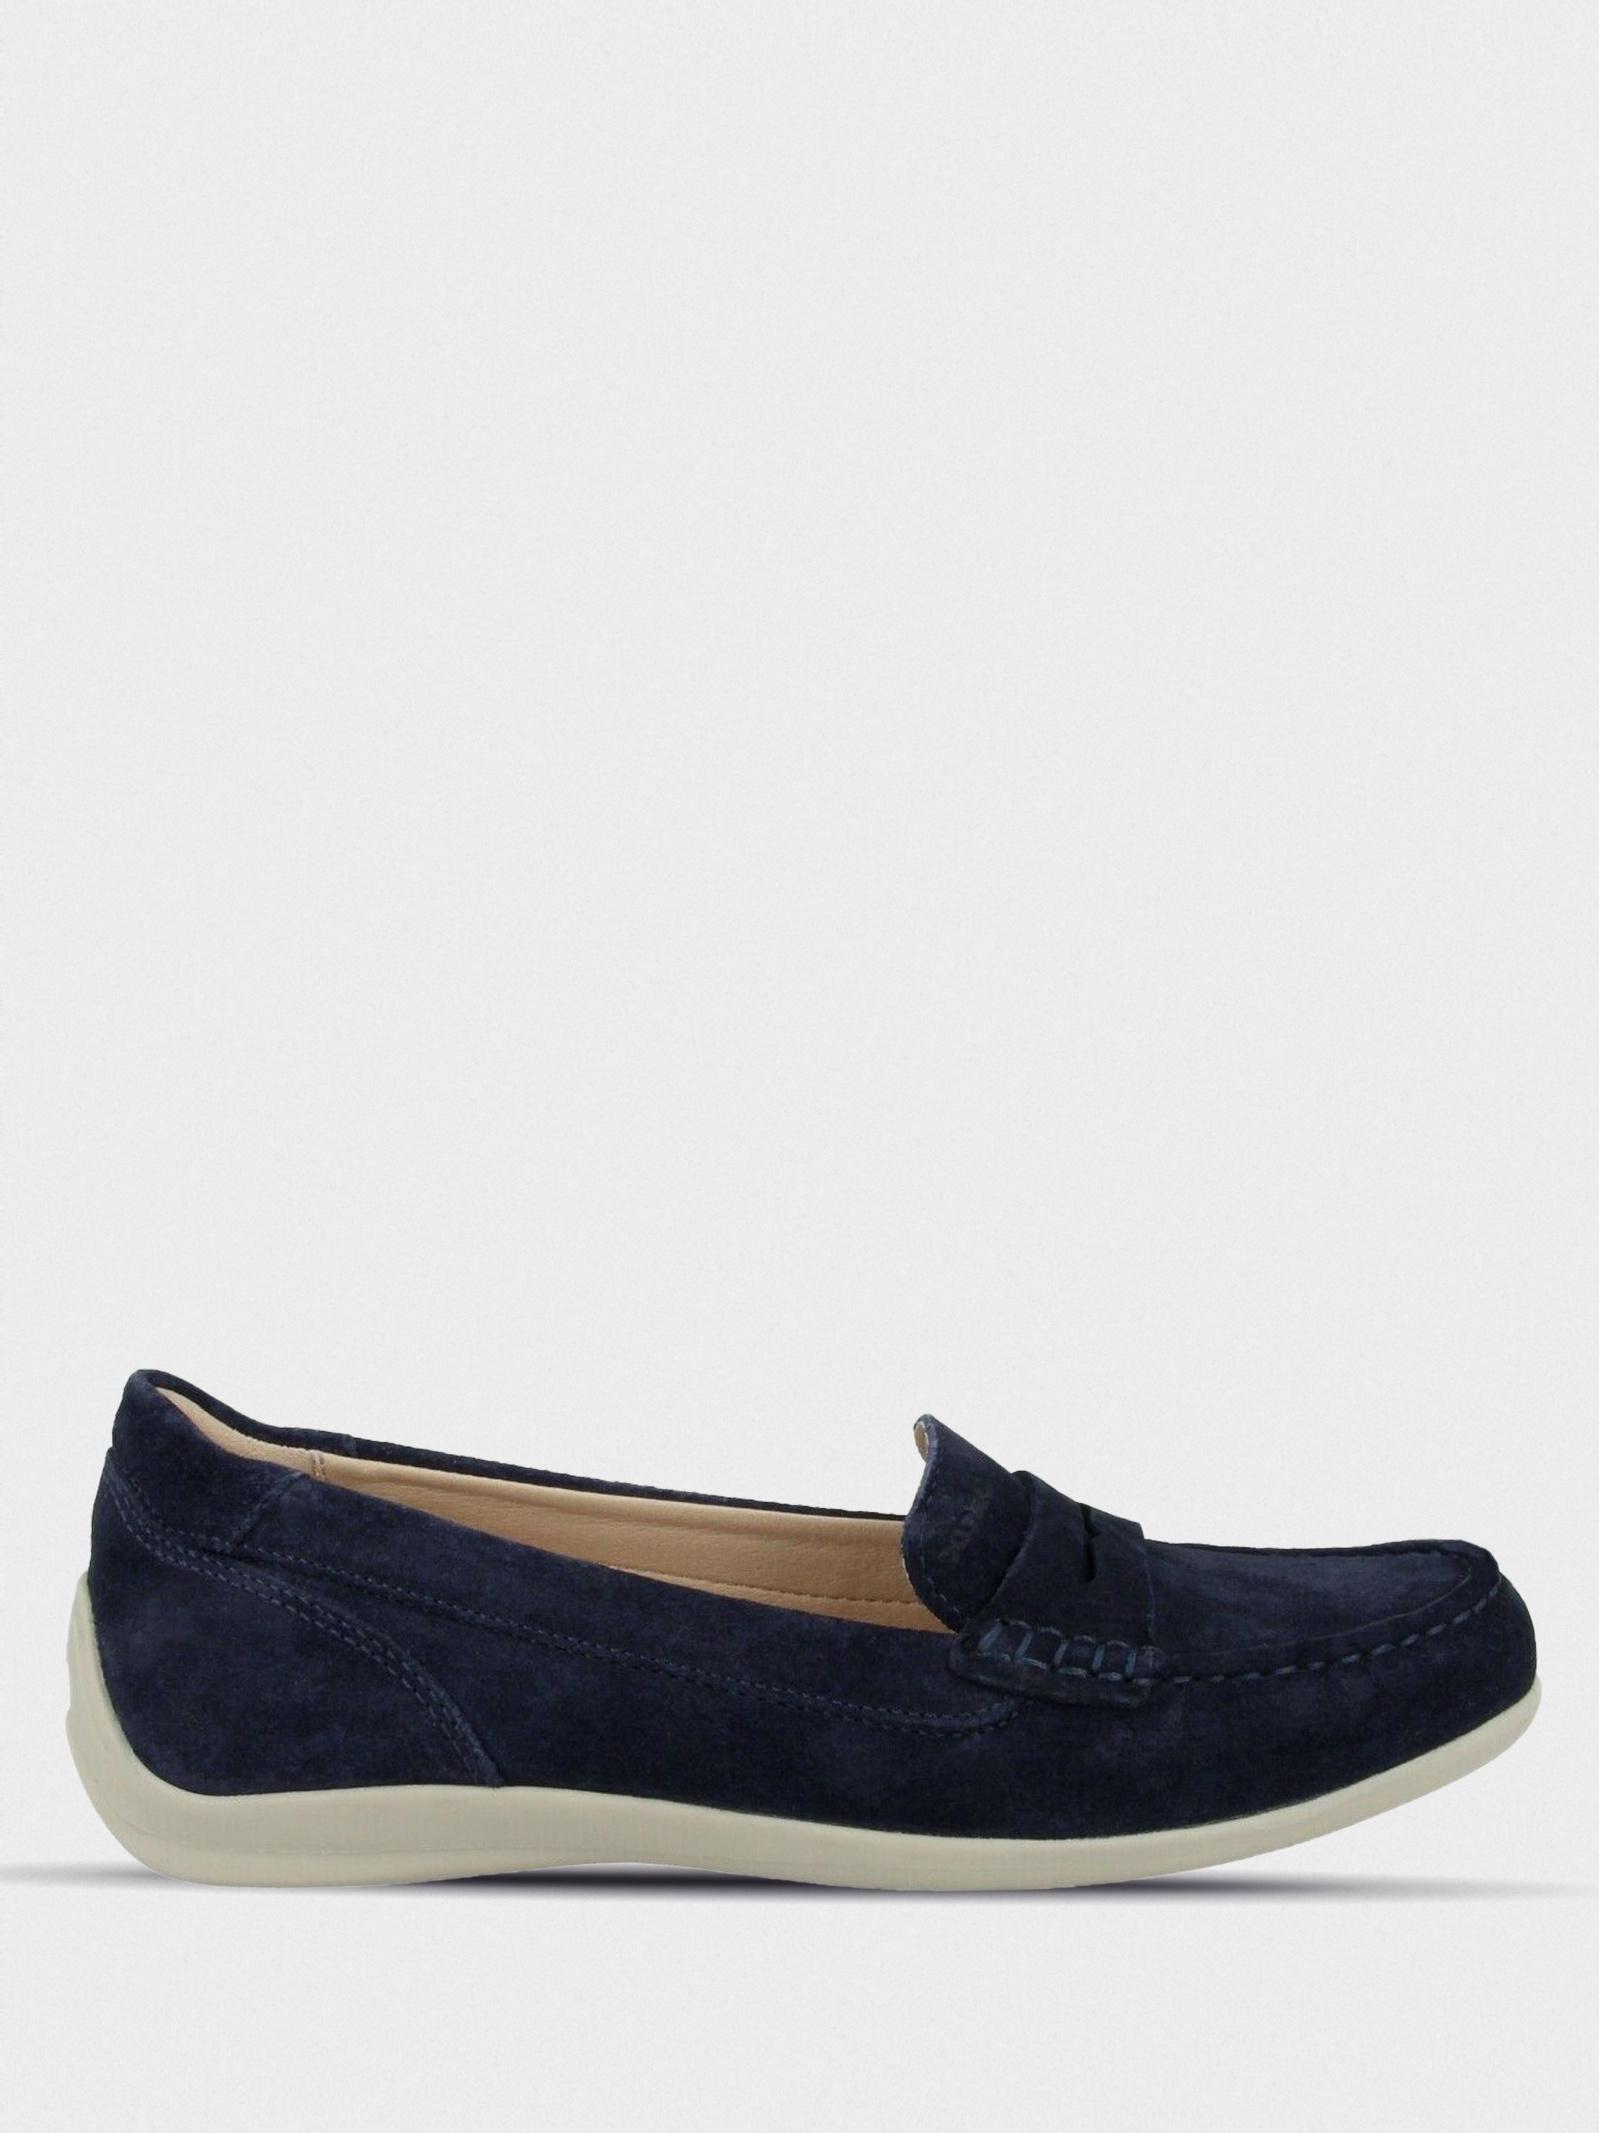 Мокасины для женщин Geox D YUKI XW3781 модная обувь, 2017